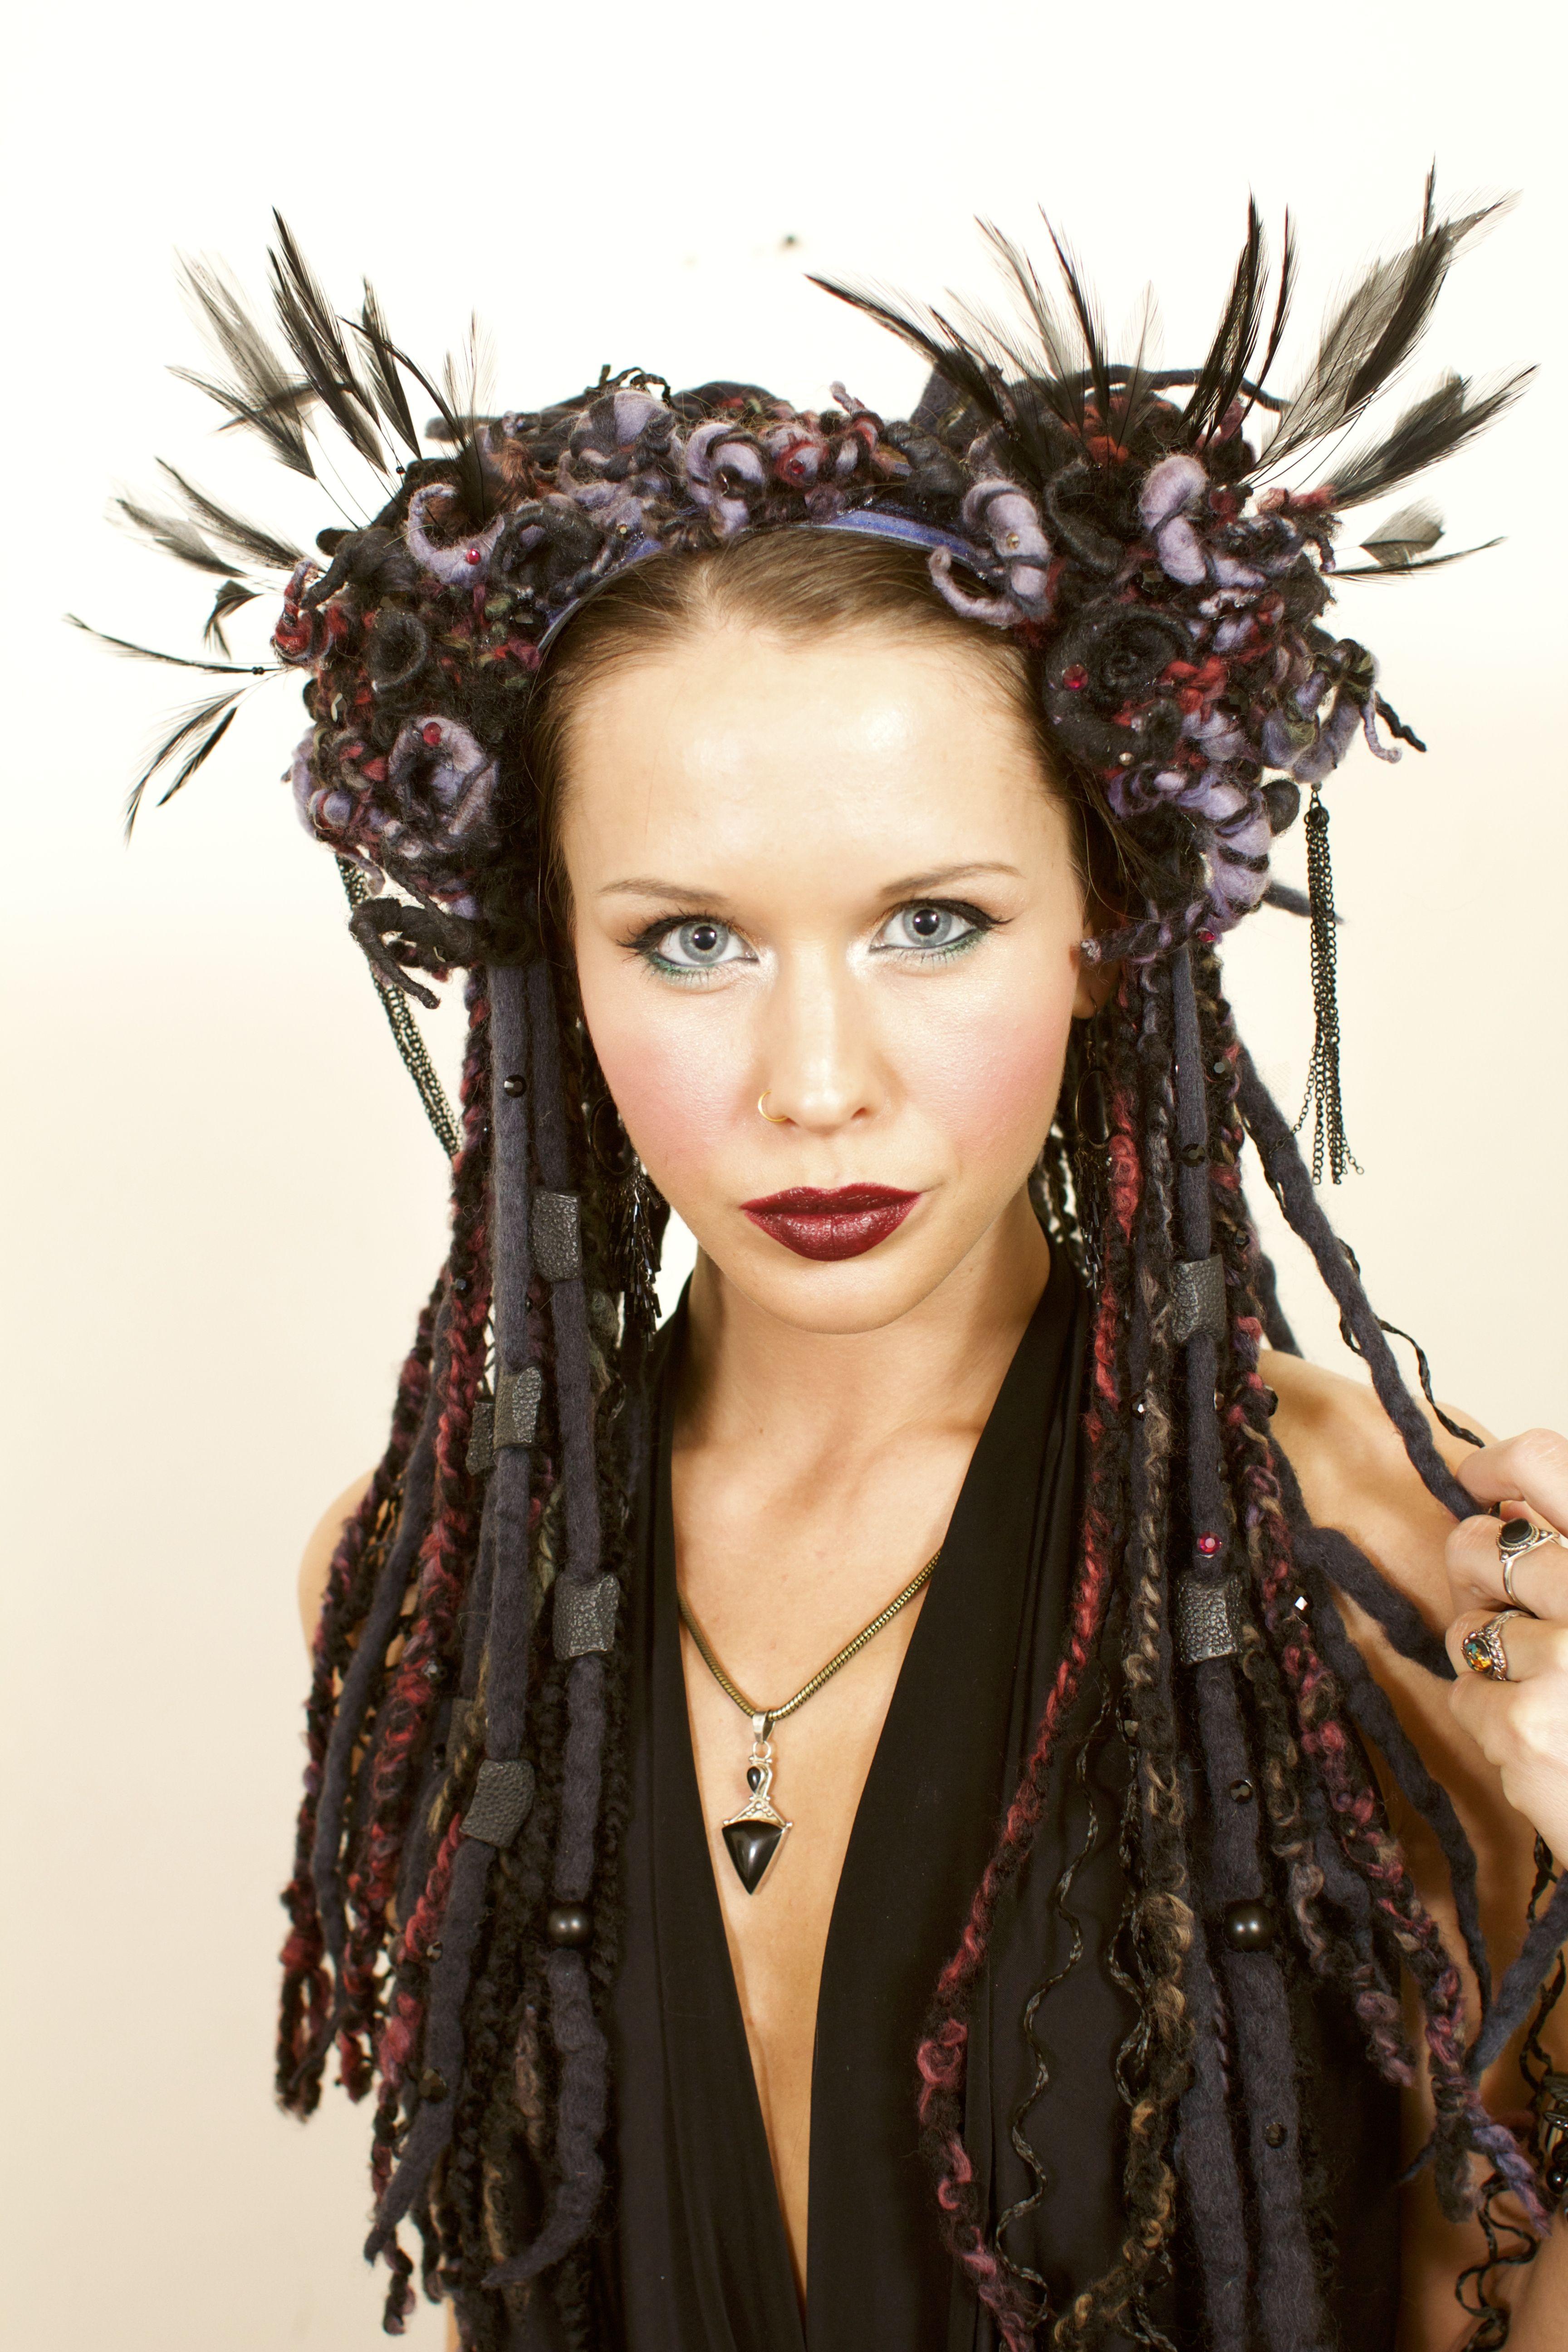 Black Feather Headdress and Dread Falls | Headdress, Festival wear ...